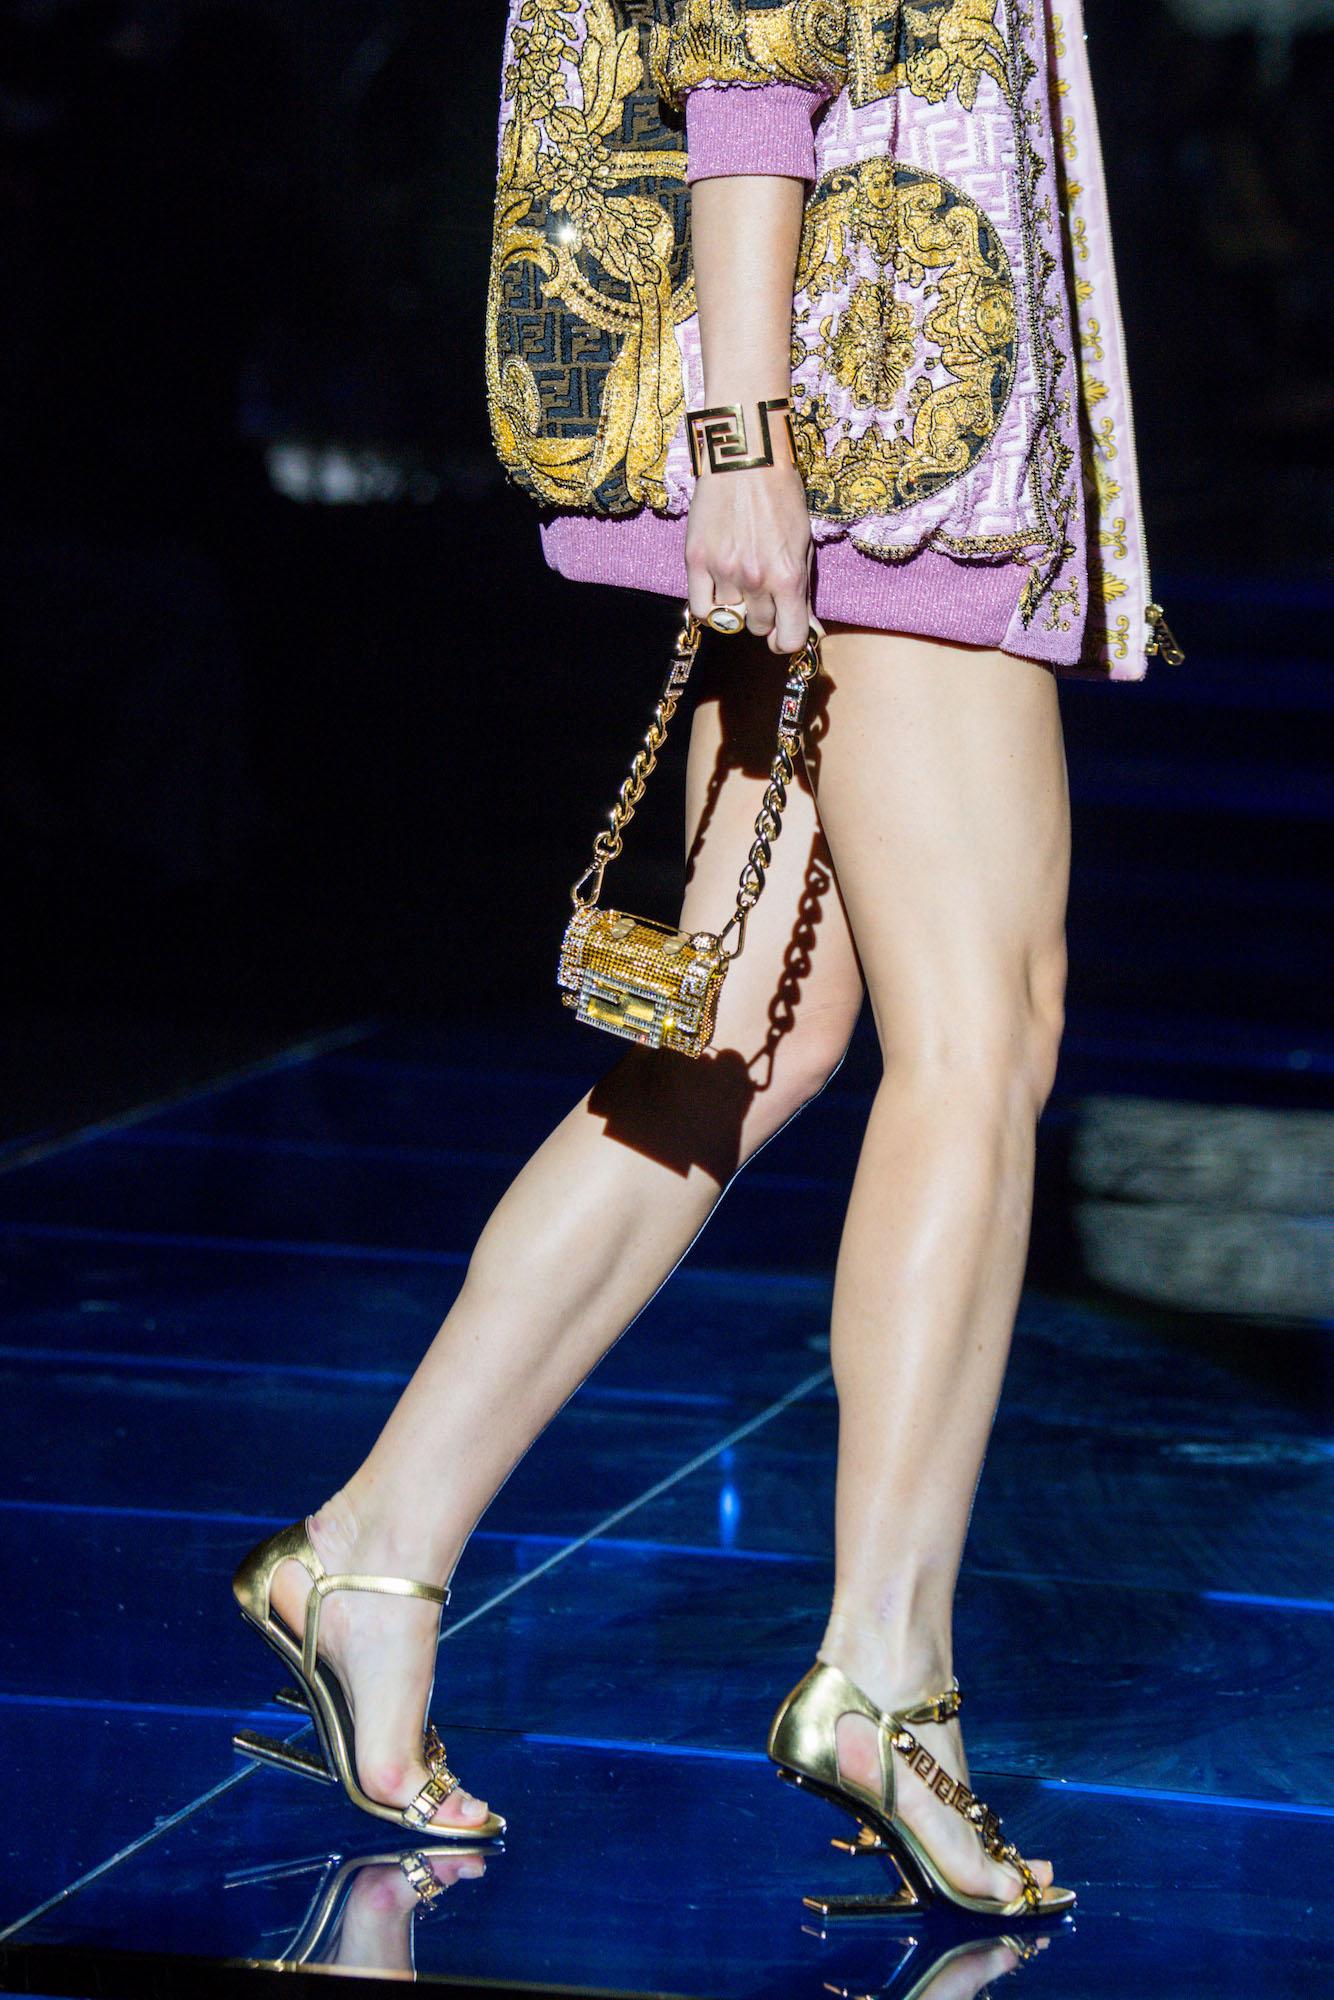 versace by fendi details (31)